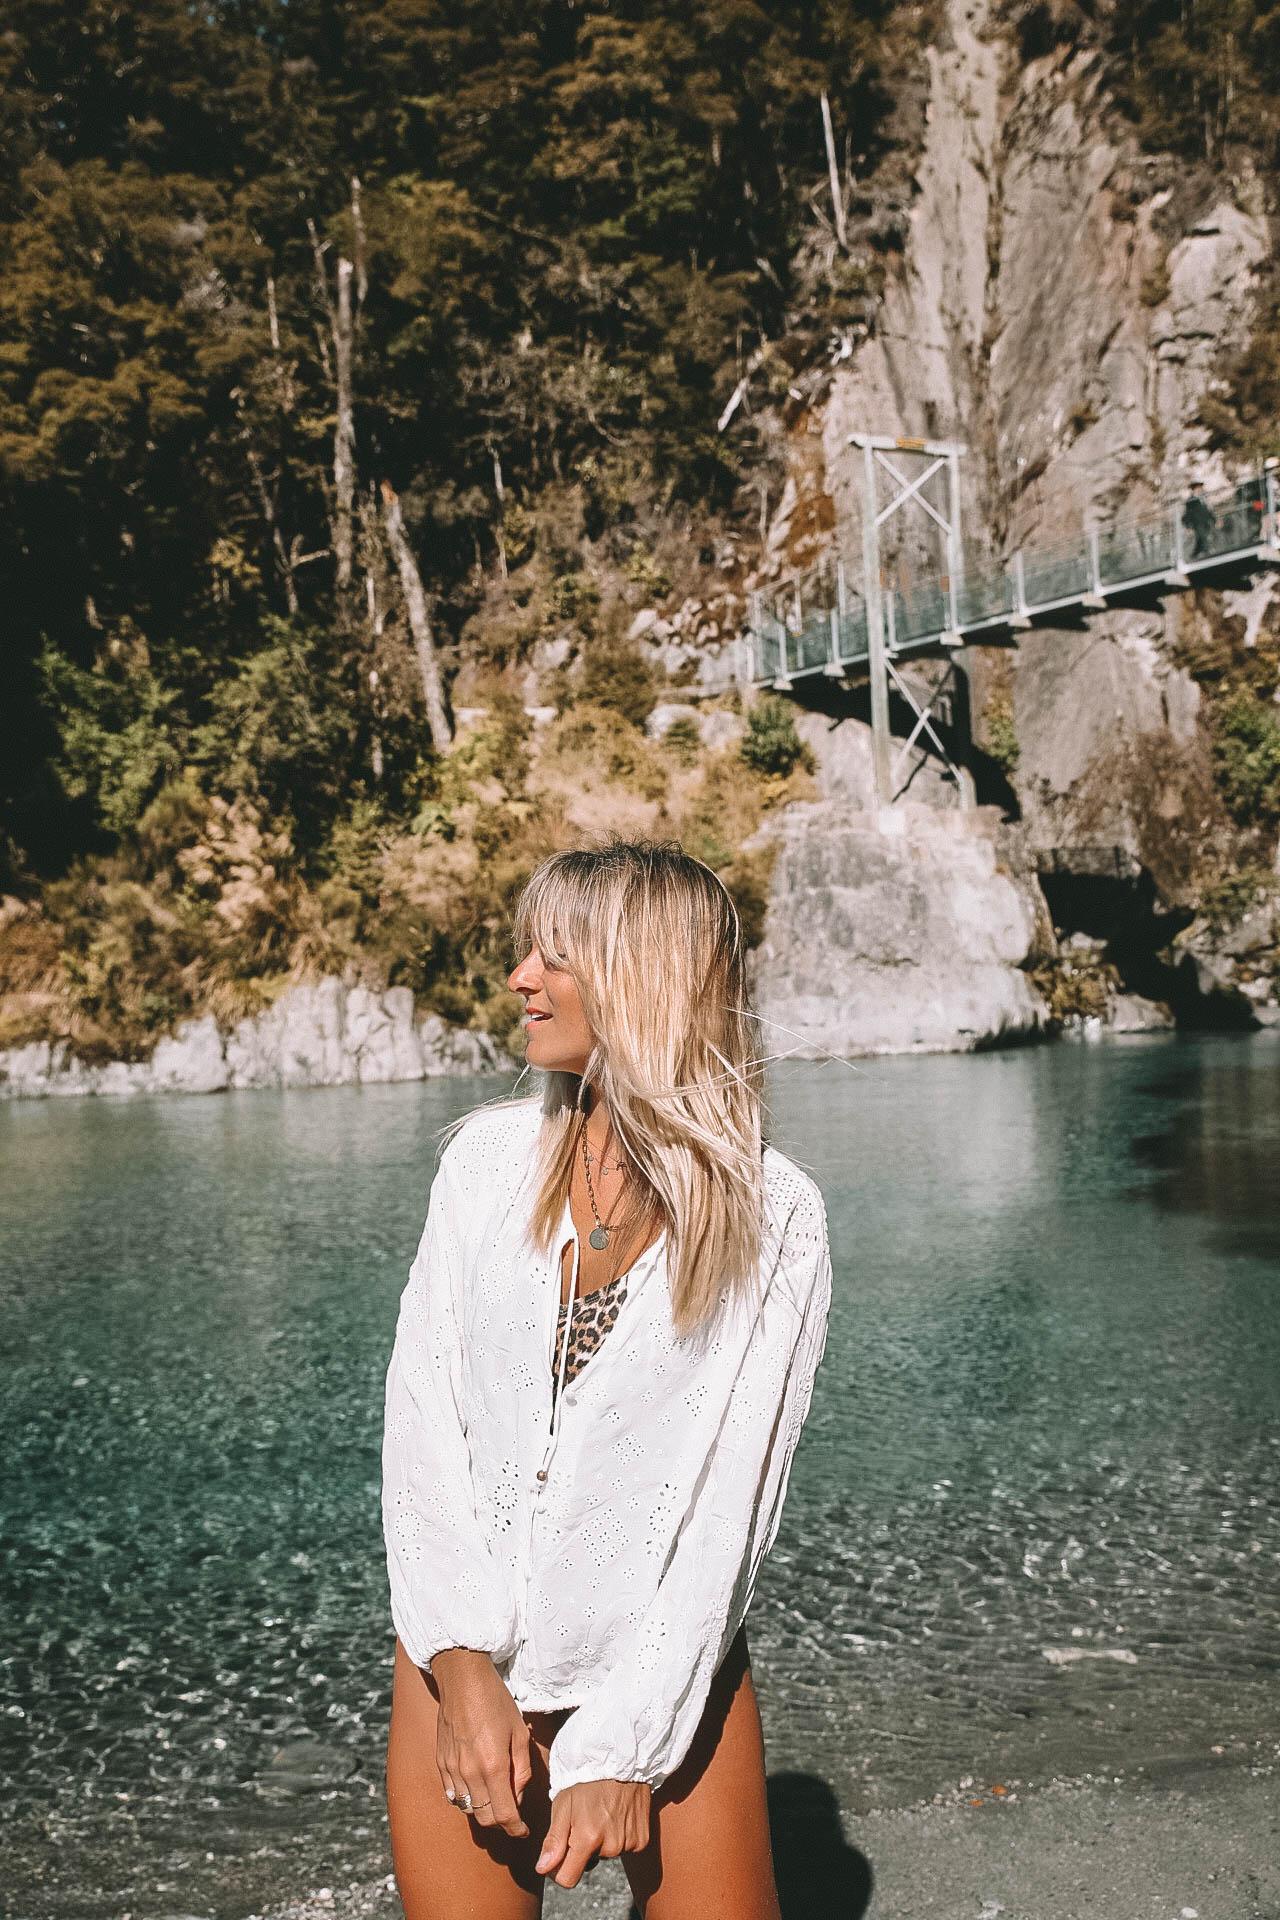 Blue Pools Nouvelle-Zélande - Blondie Baby blog voyages et mode